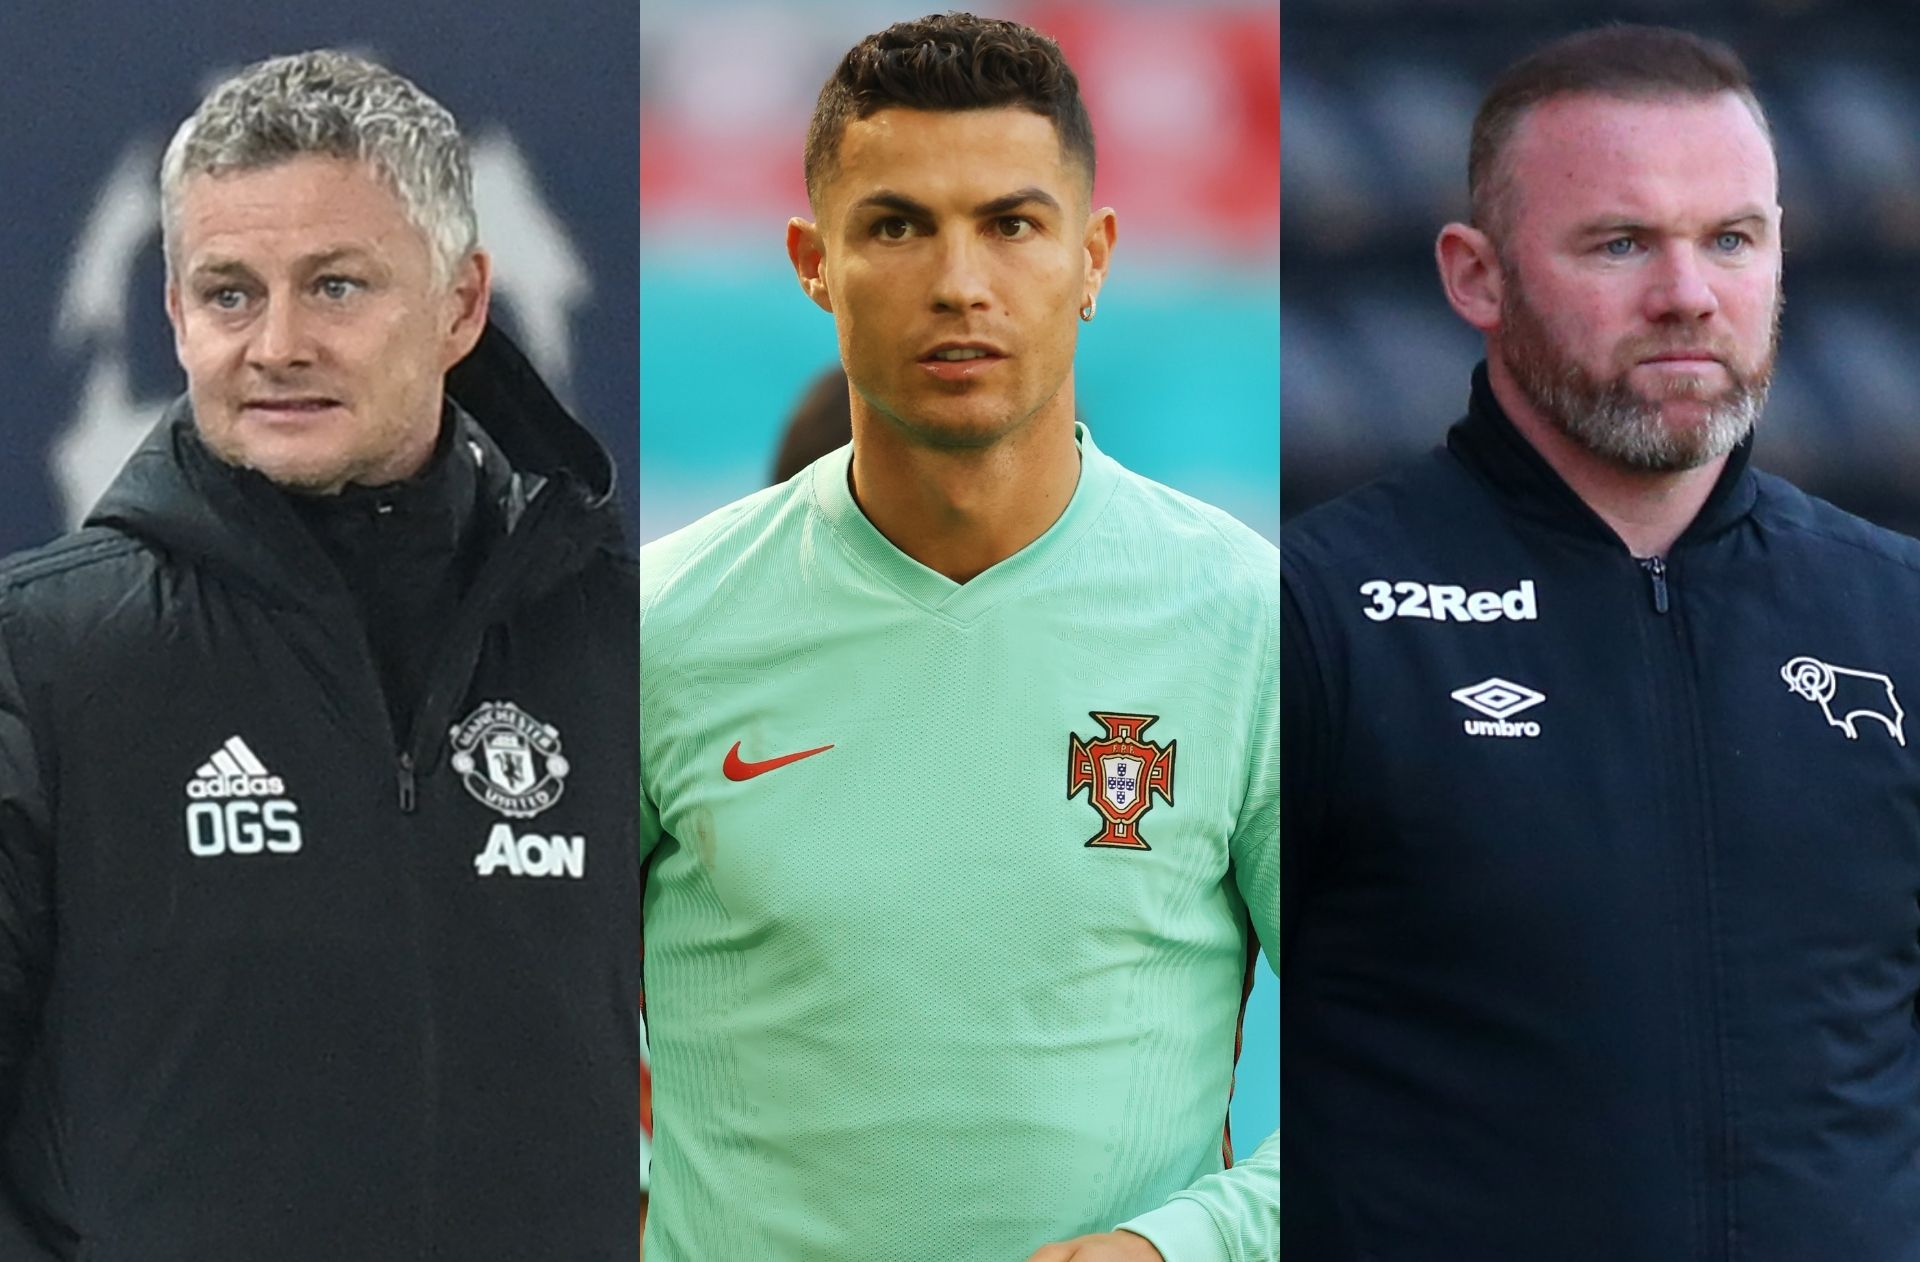 Ole Gunnar Solskjaer, Cristiano Ronaldo, Wayne Rooney